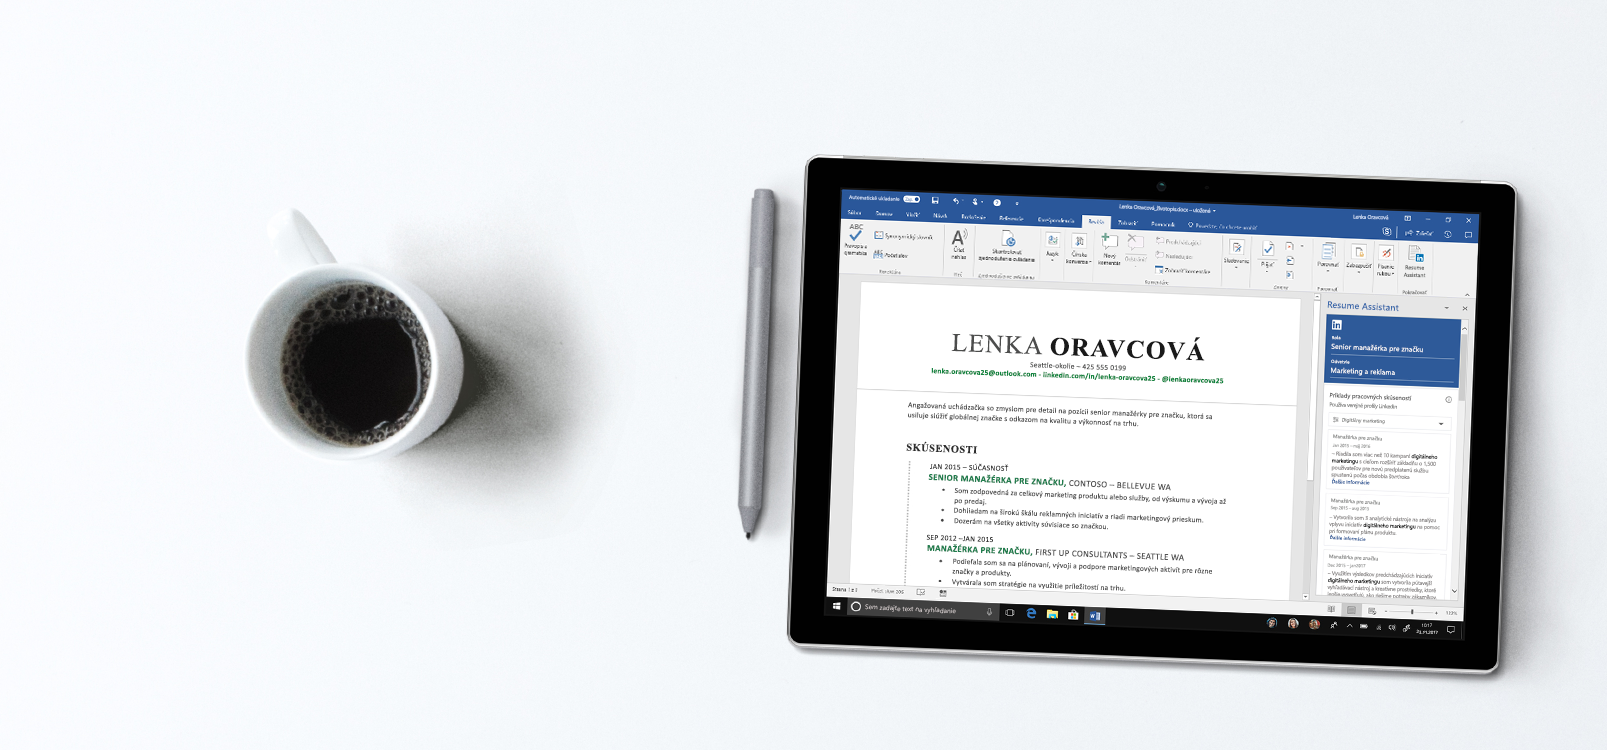 Obrazovka tabletu zobrazujúca Word s panelom doplnku Resume Assistant na pravej strane s príkladmi životopisov